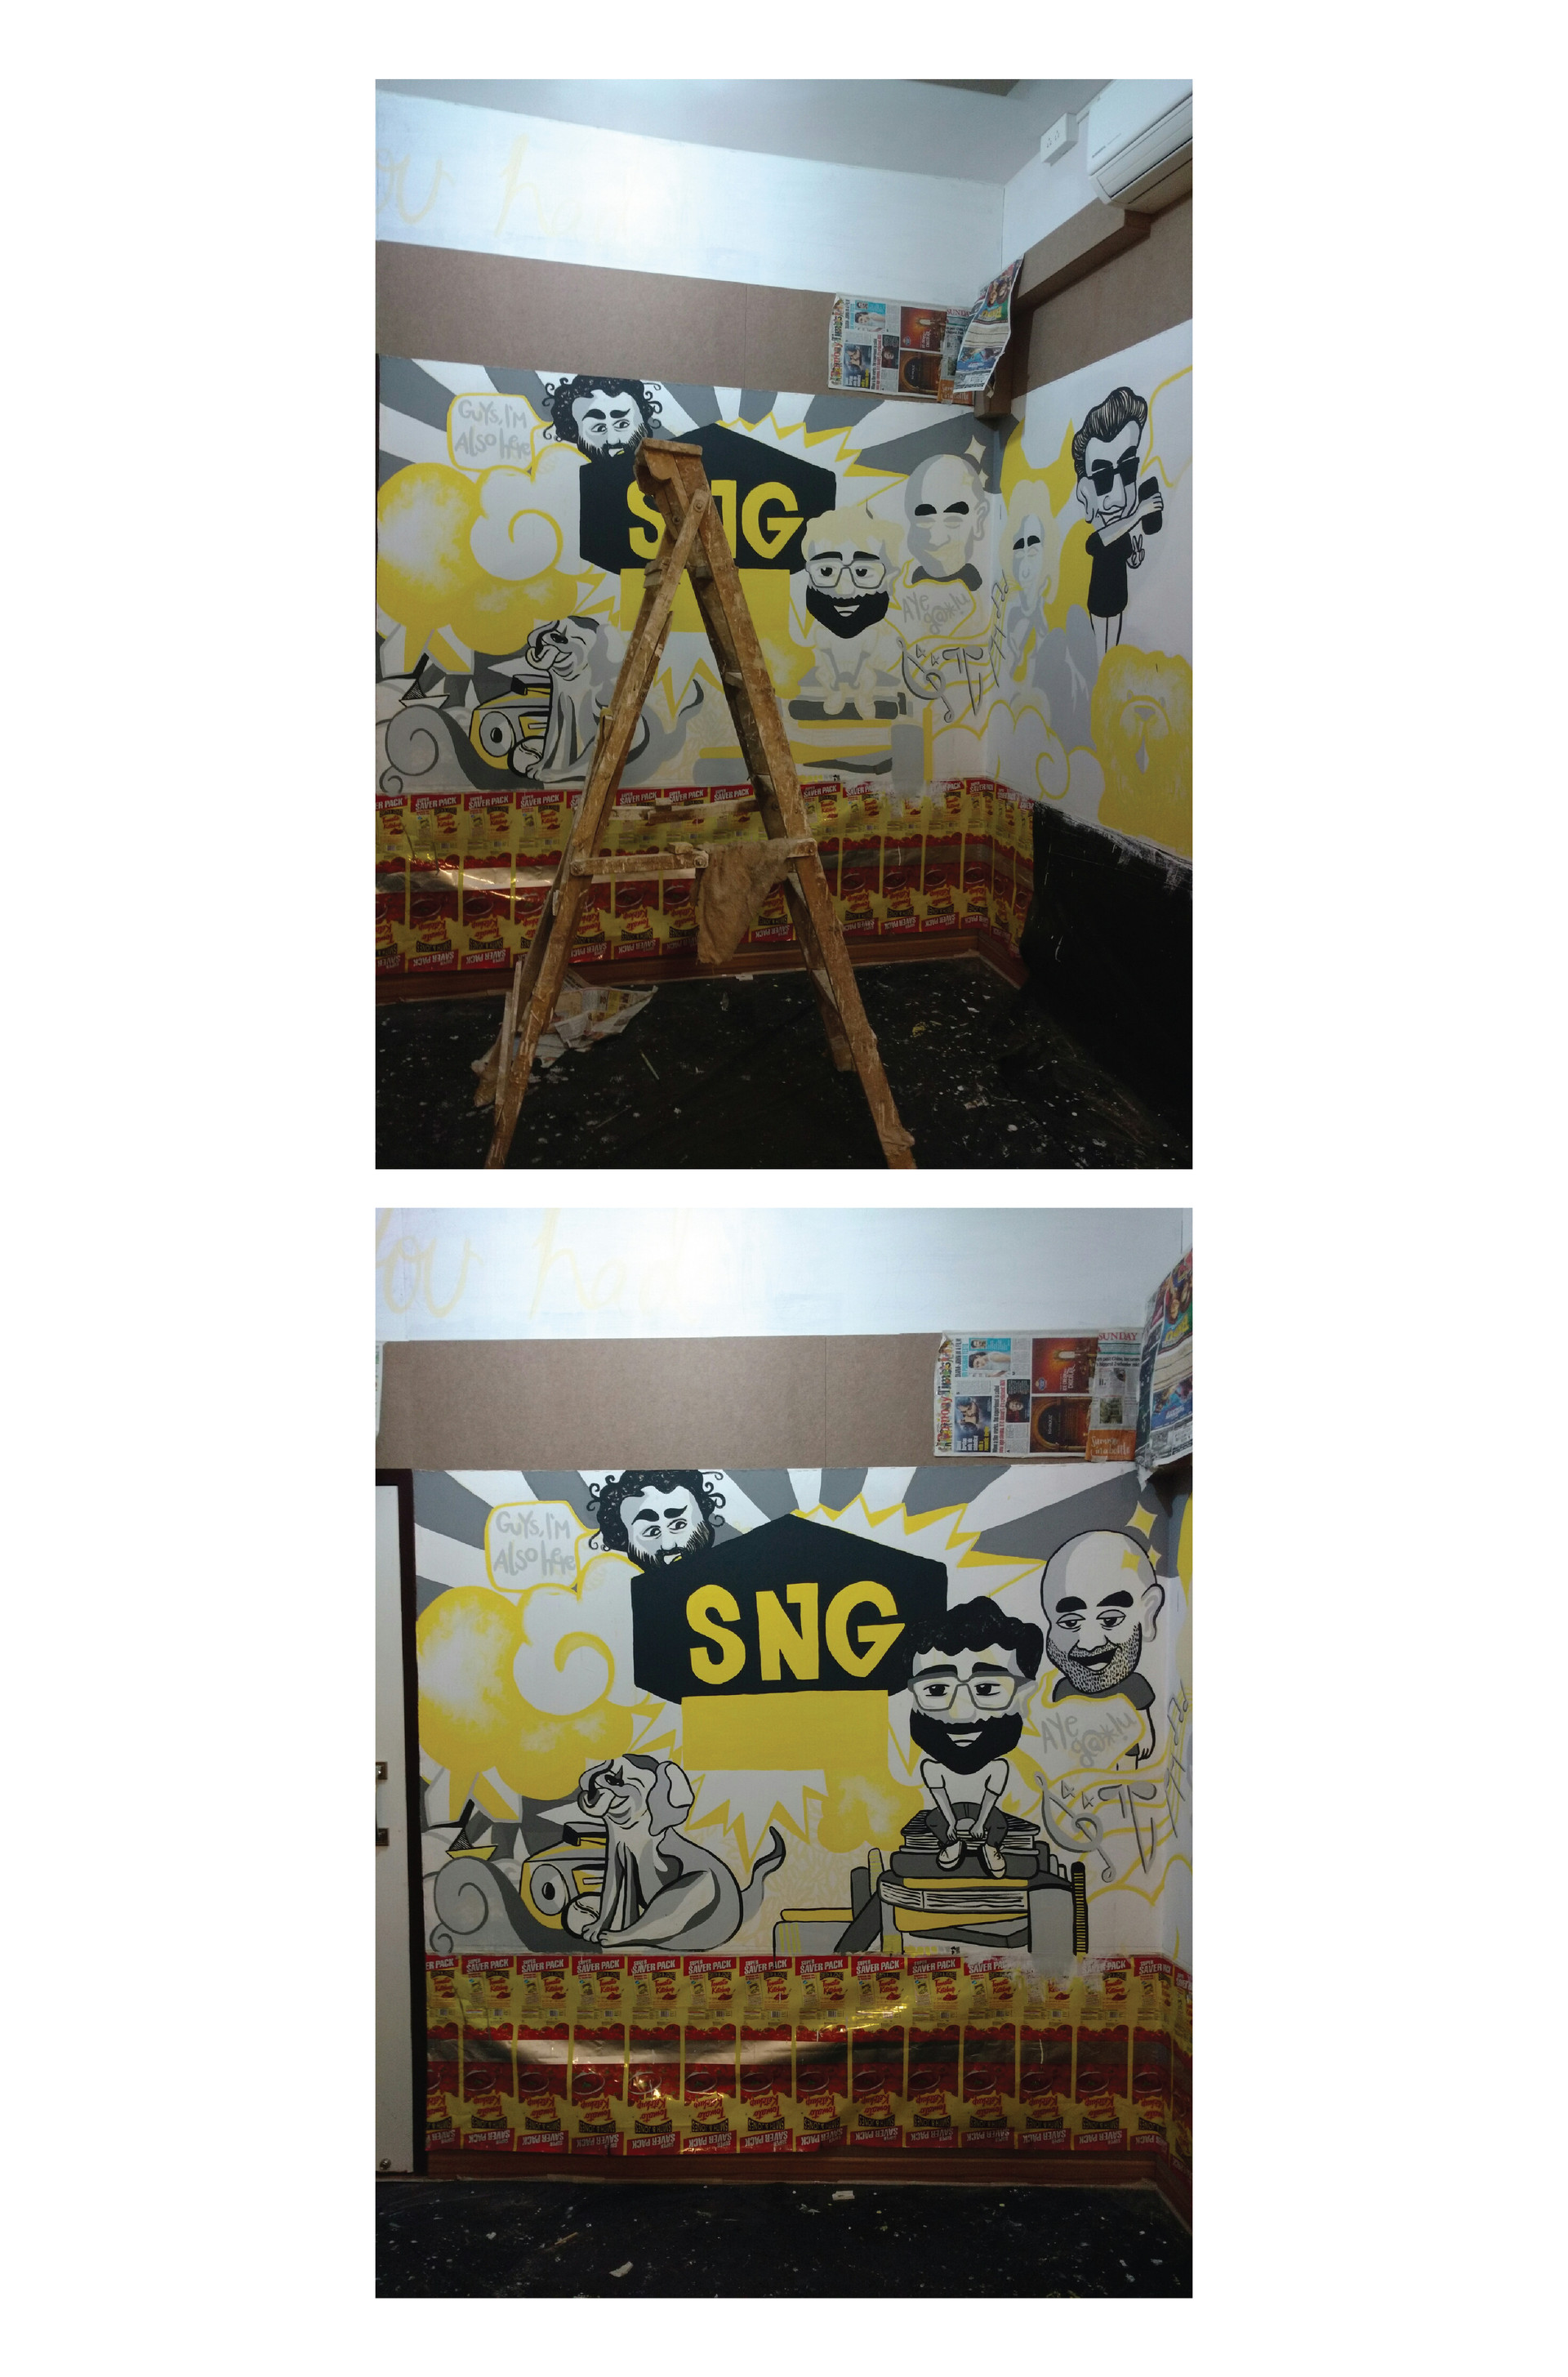 SnG-wallmural-07.jpg